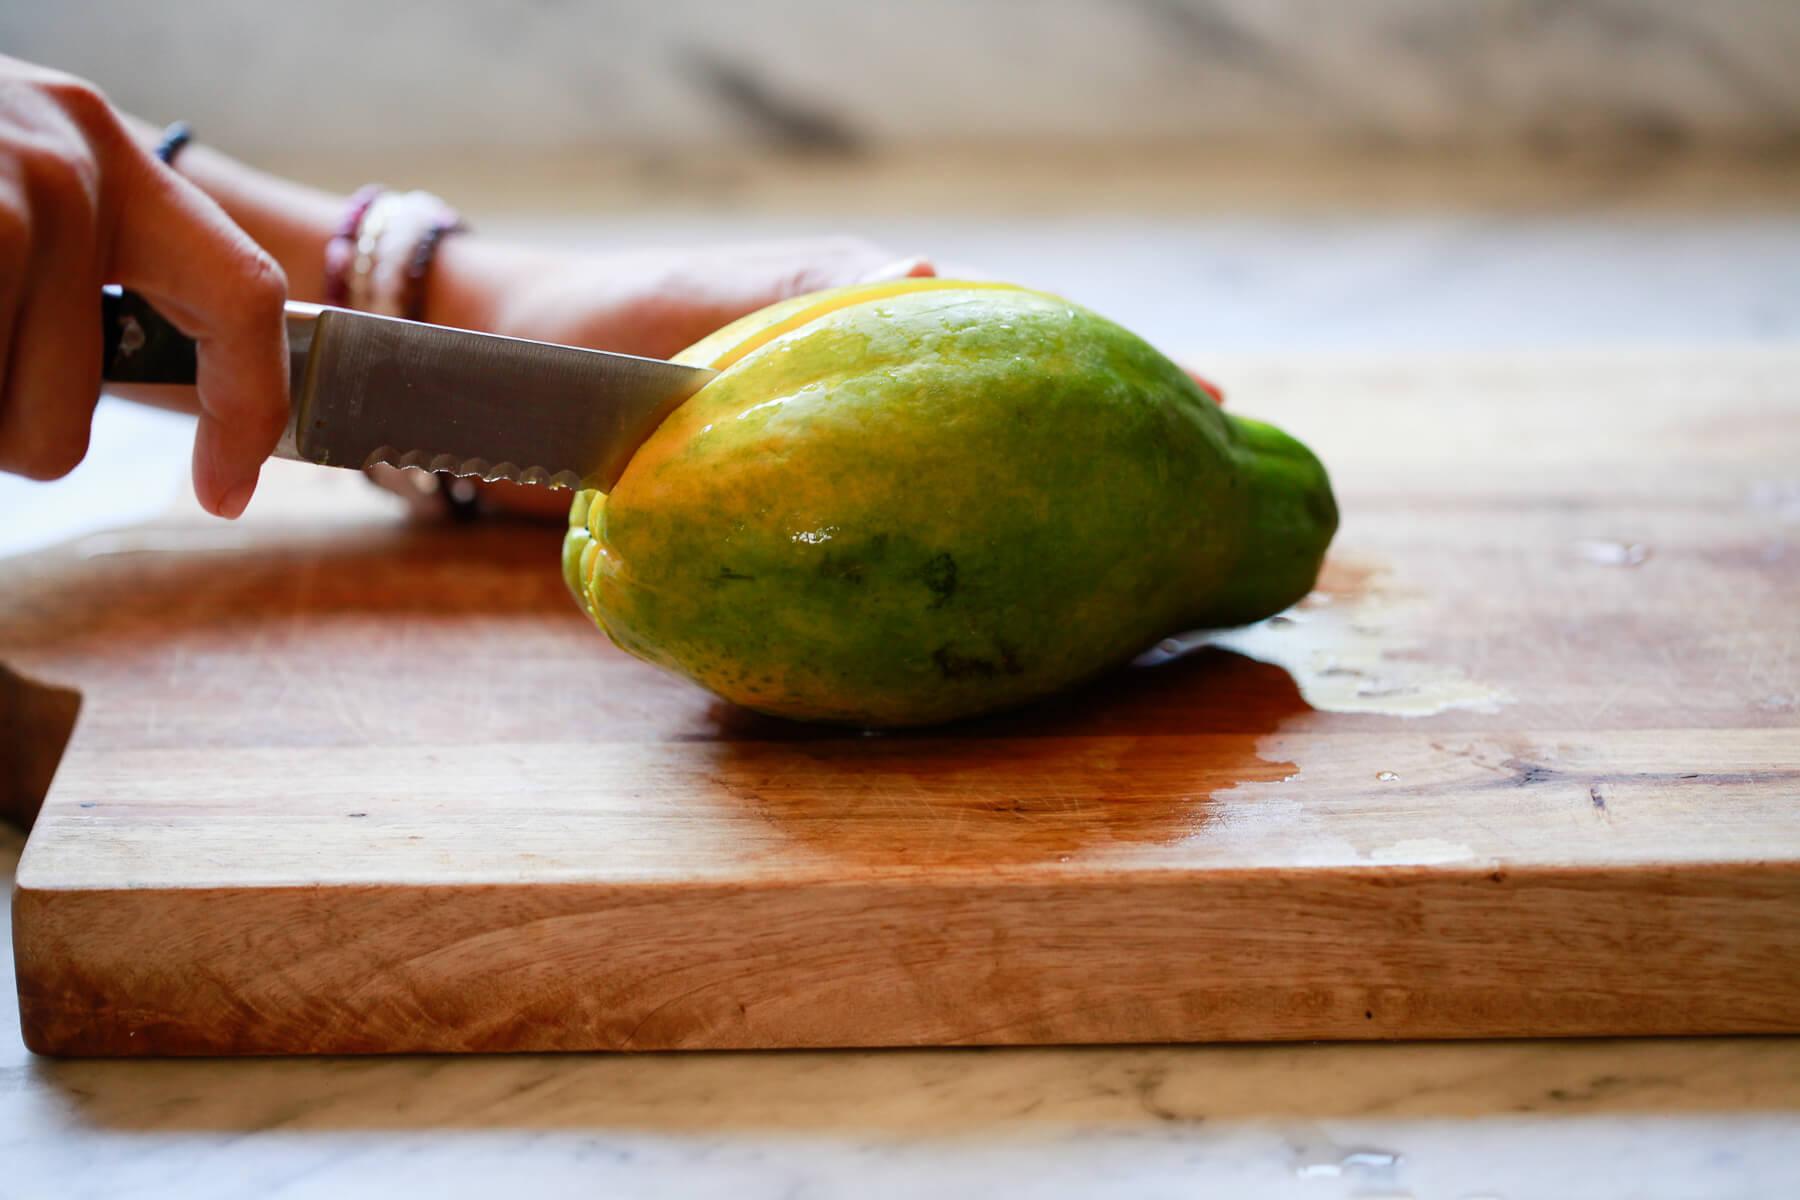 A knife cuts a papaya in half.